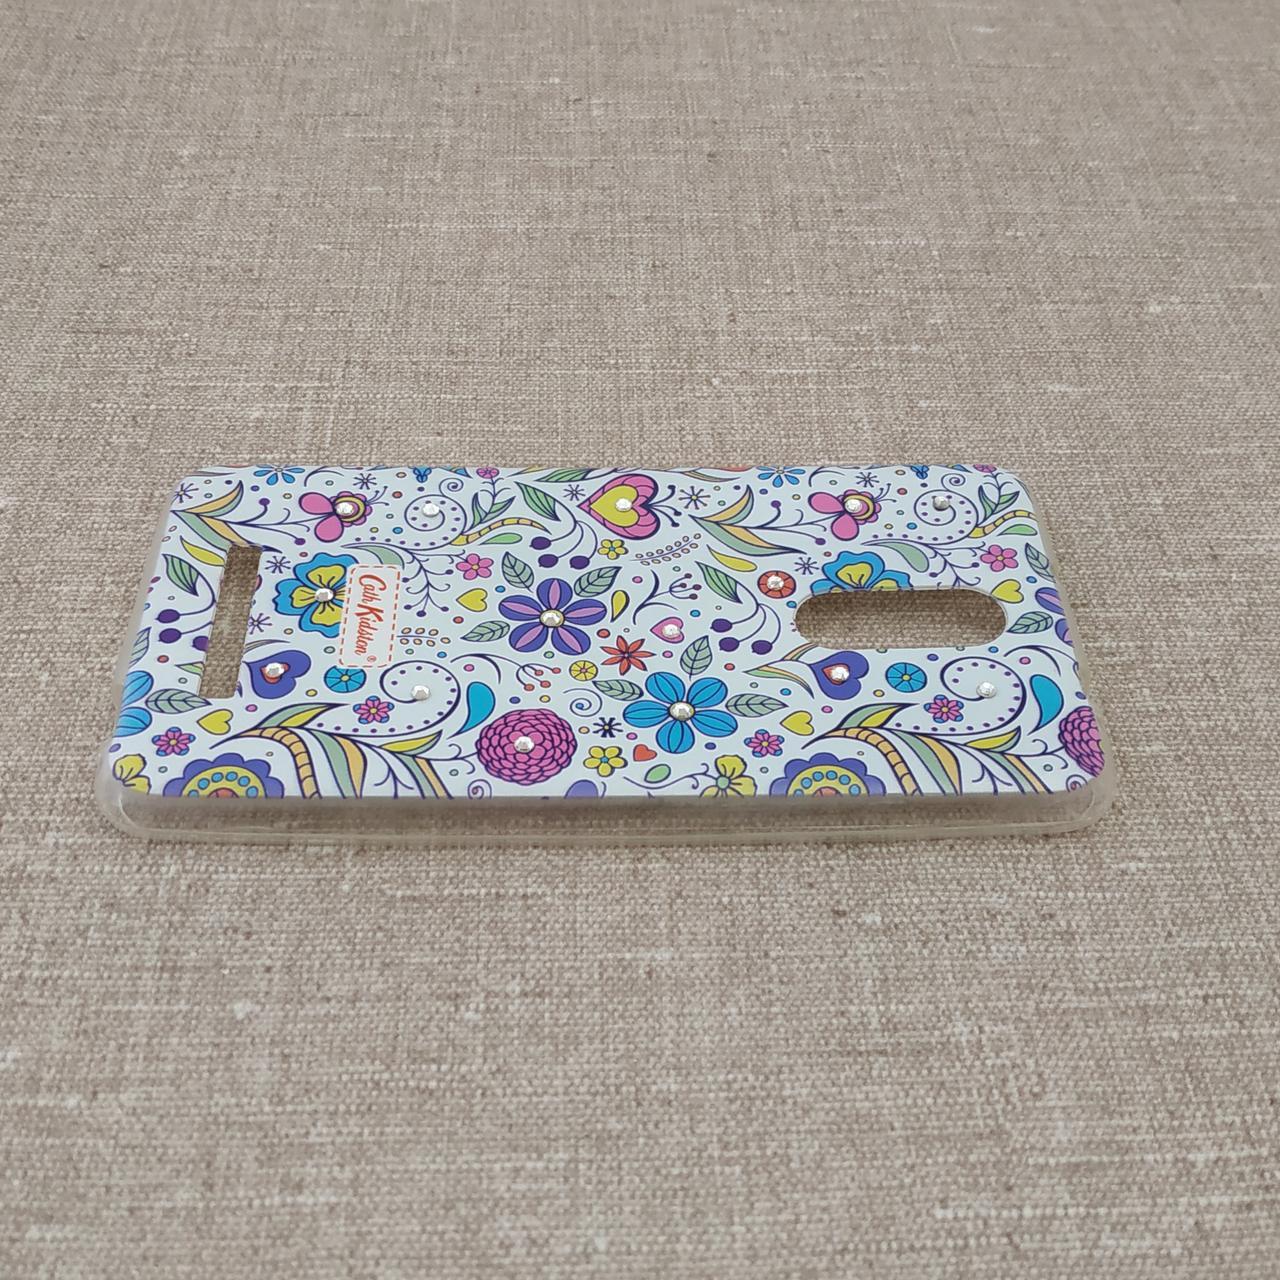 Чехлы для Xiaomi Redmi Note 3 / Pro TPU Diamond Для телефона